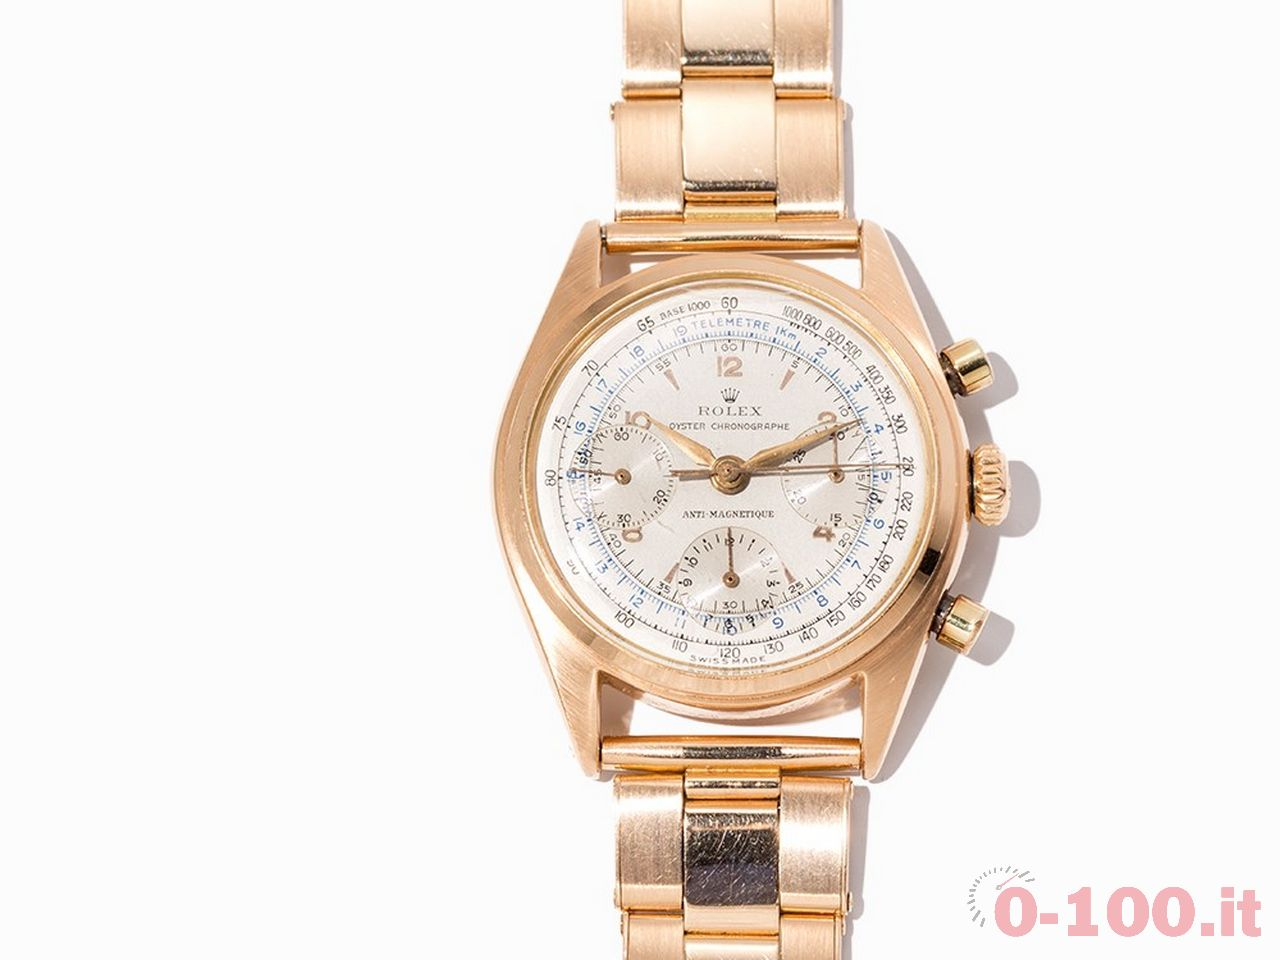 auctionata-rolex-oyster-chronograph-ref-6034-switzerland-around-1950-eric-claptons-collection_0-1002